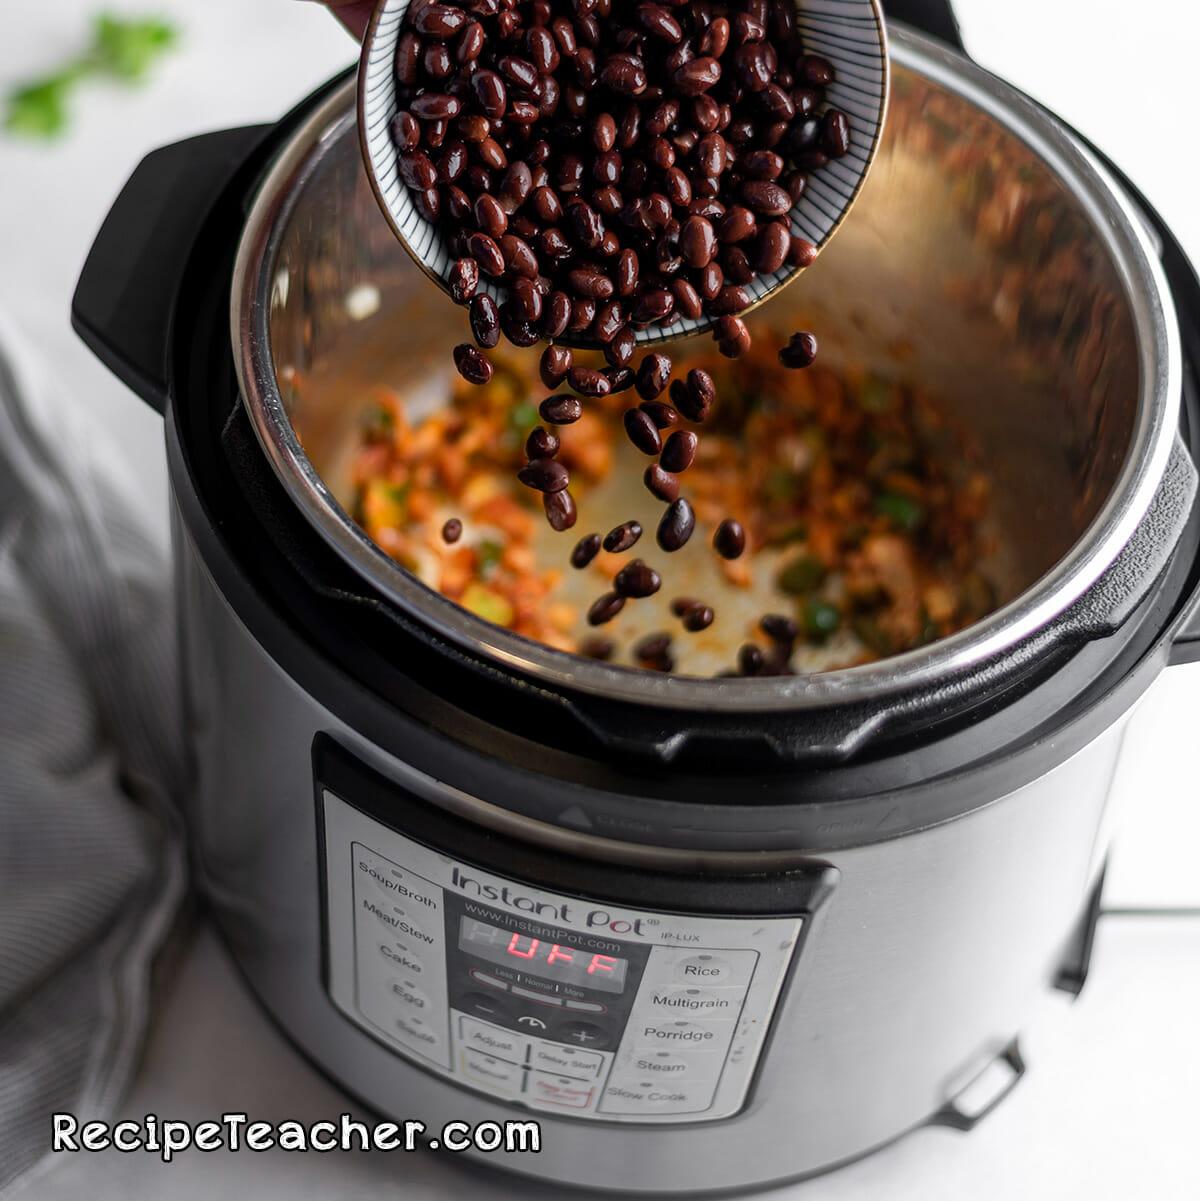 Recipe for Instant Pot vegetarian chili